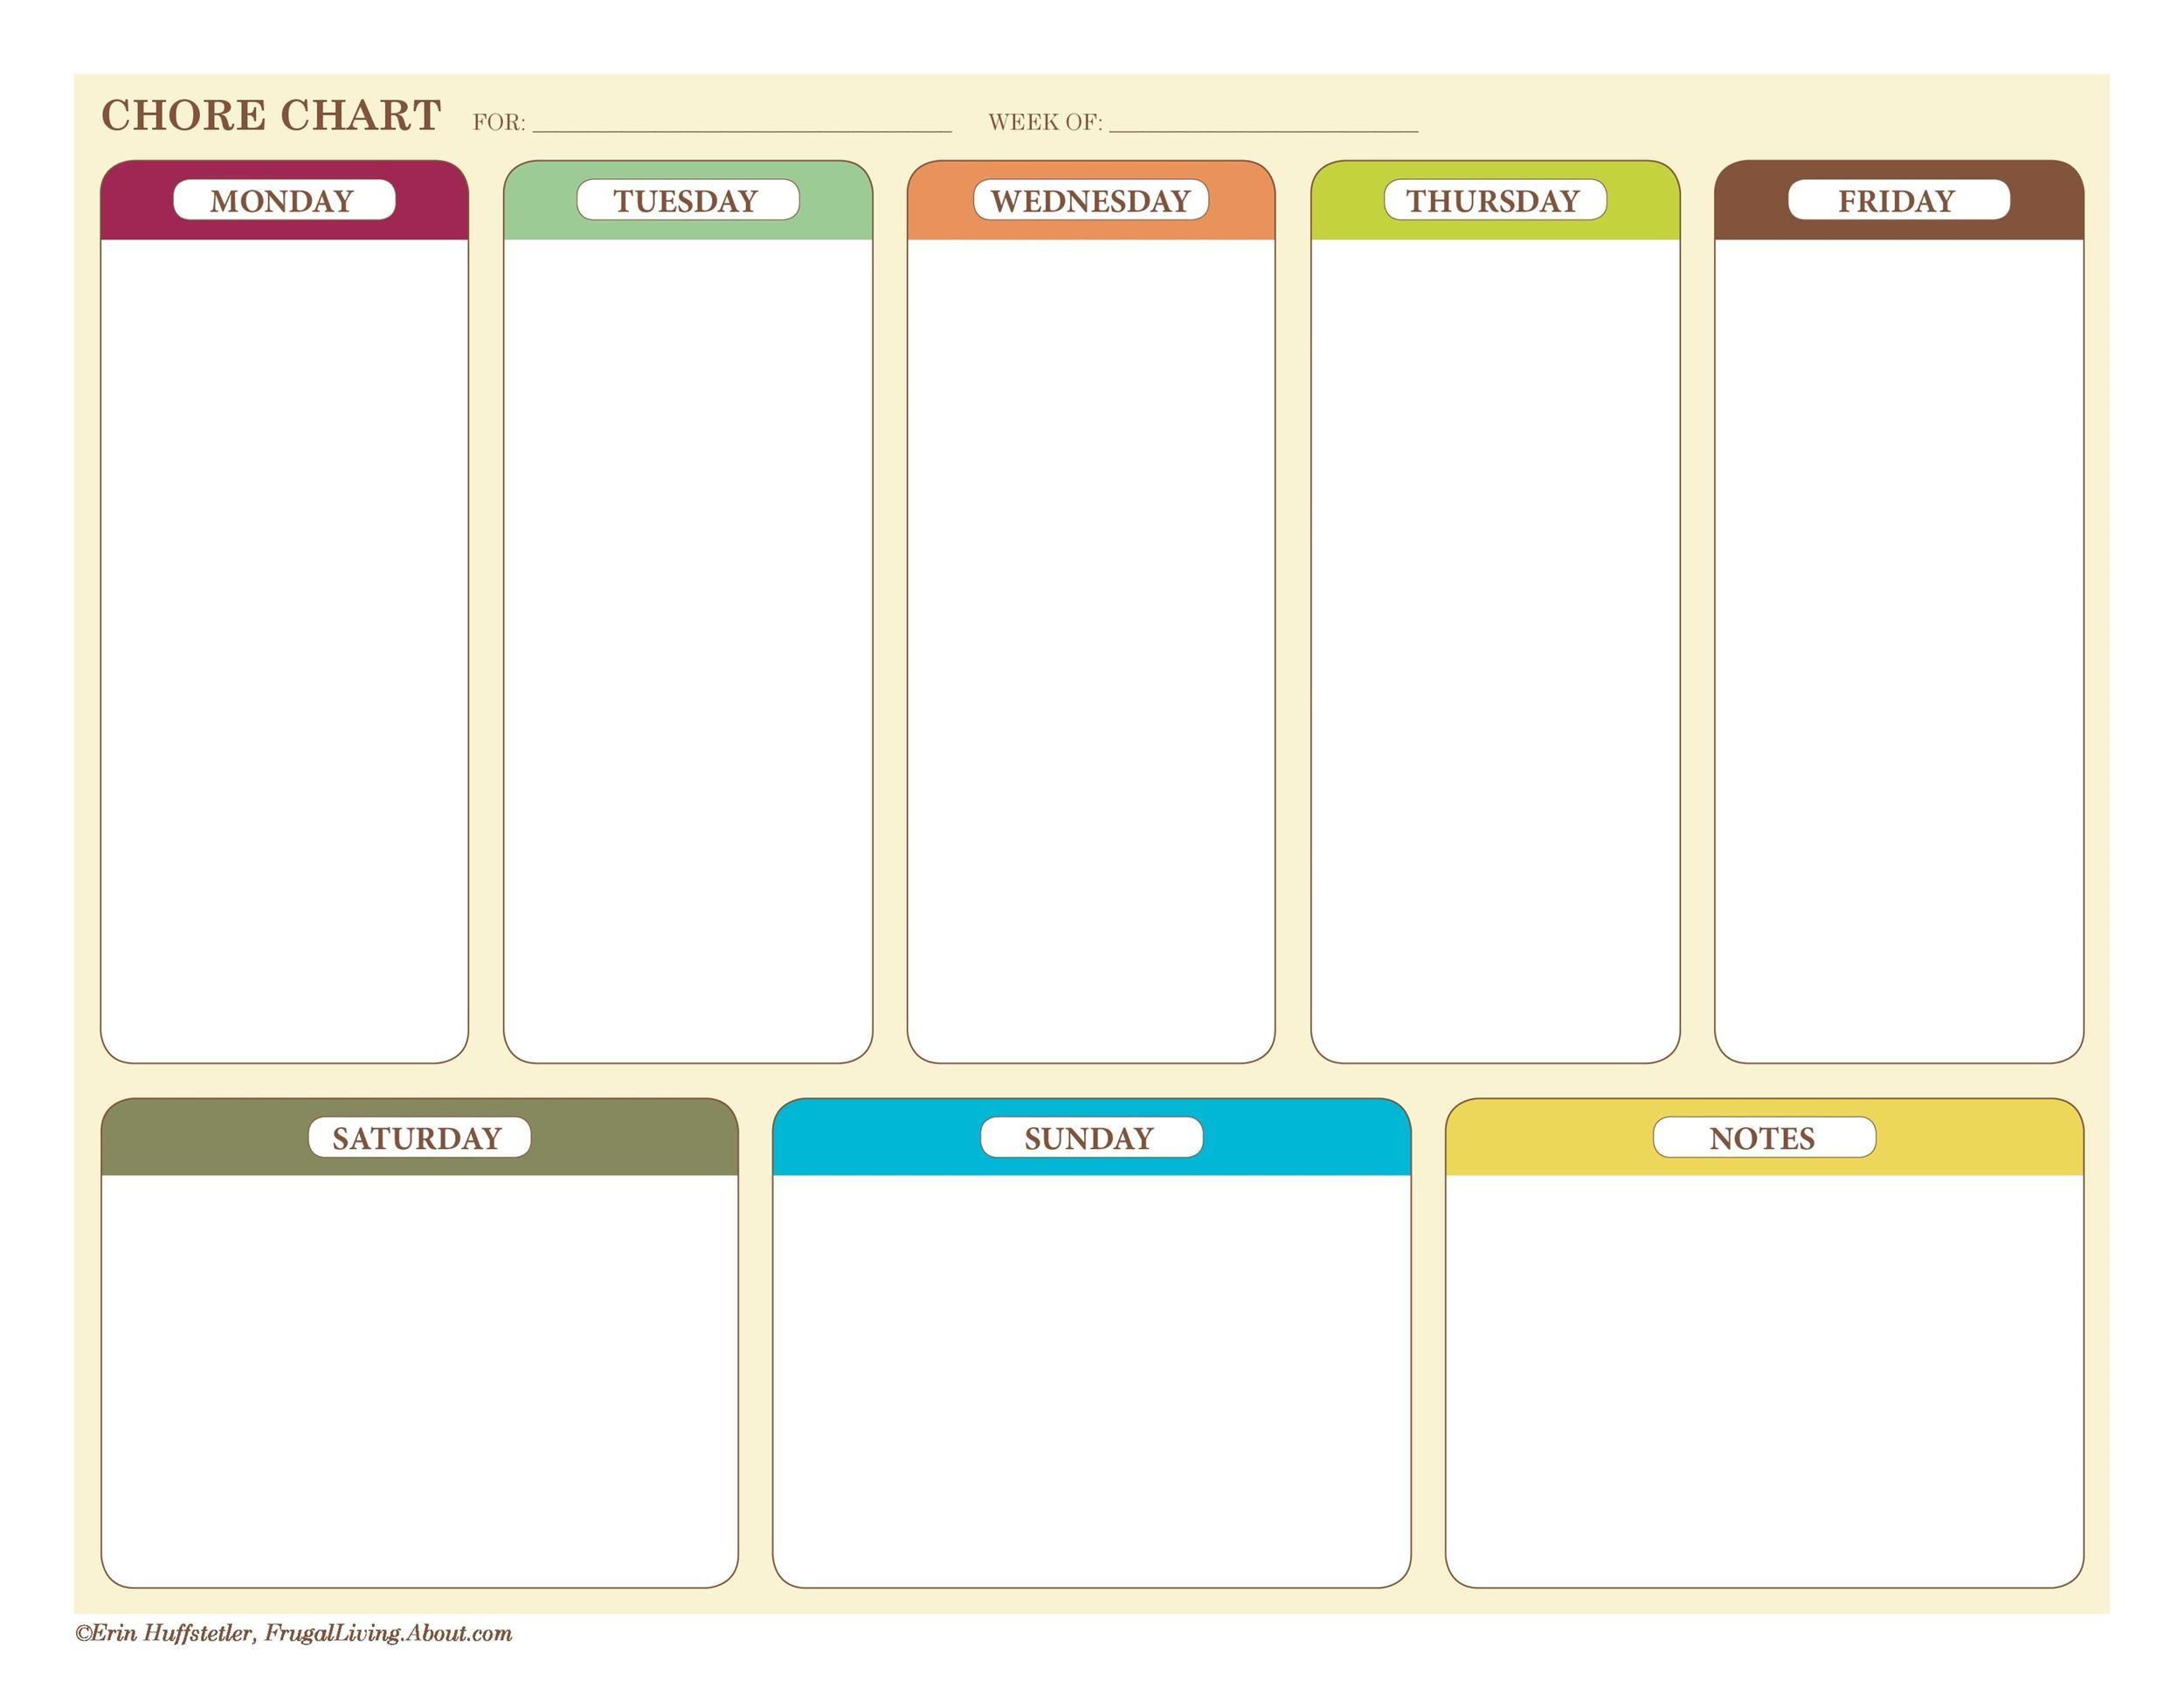 Free chore chart template 30